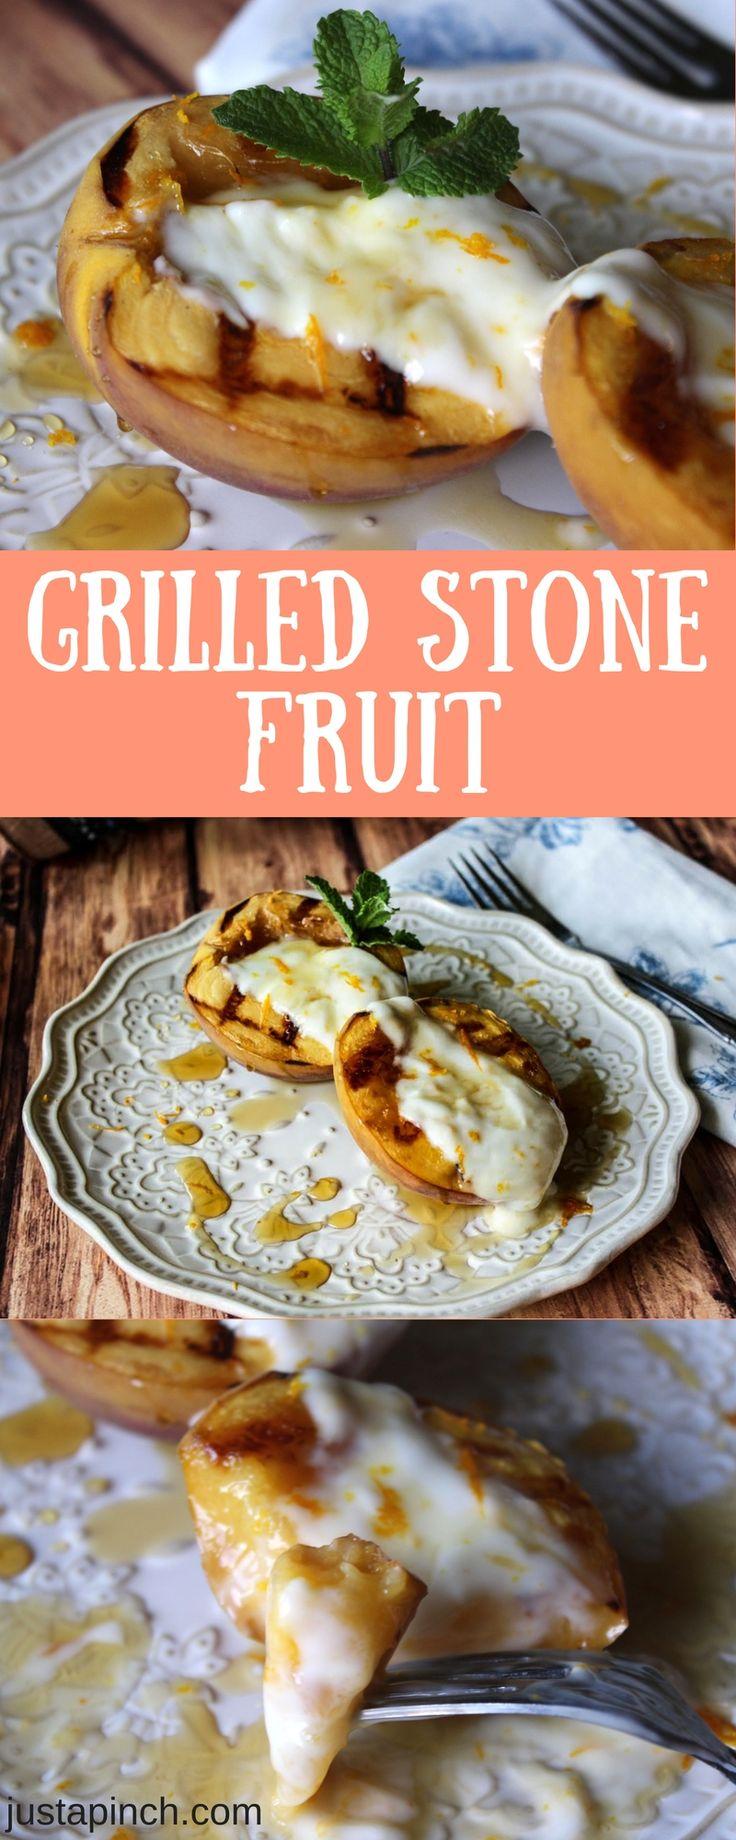 Stone Wave Dessert Recipes 193 Best Summer Dessert Recipes Images On Pinterest